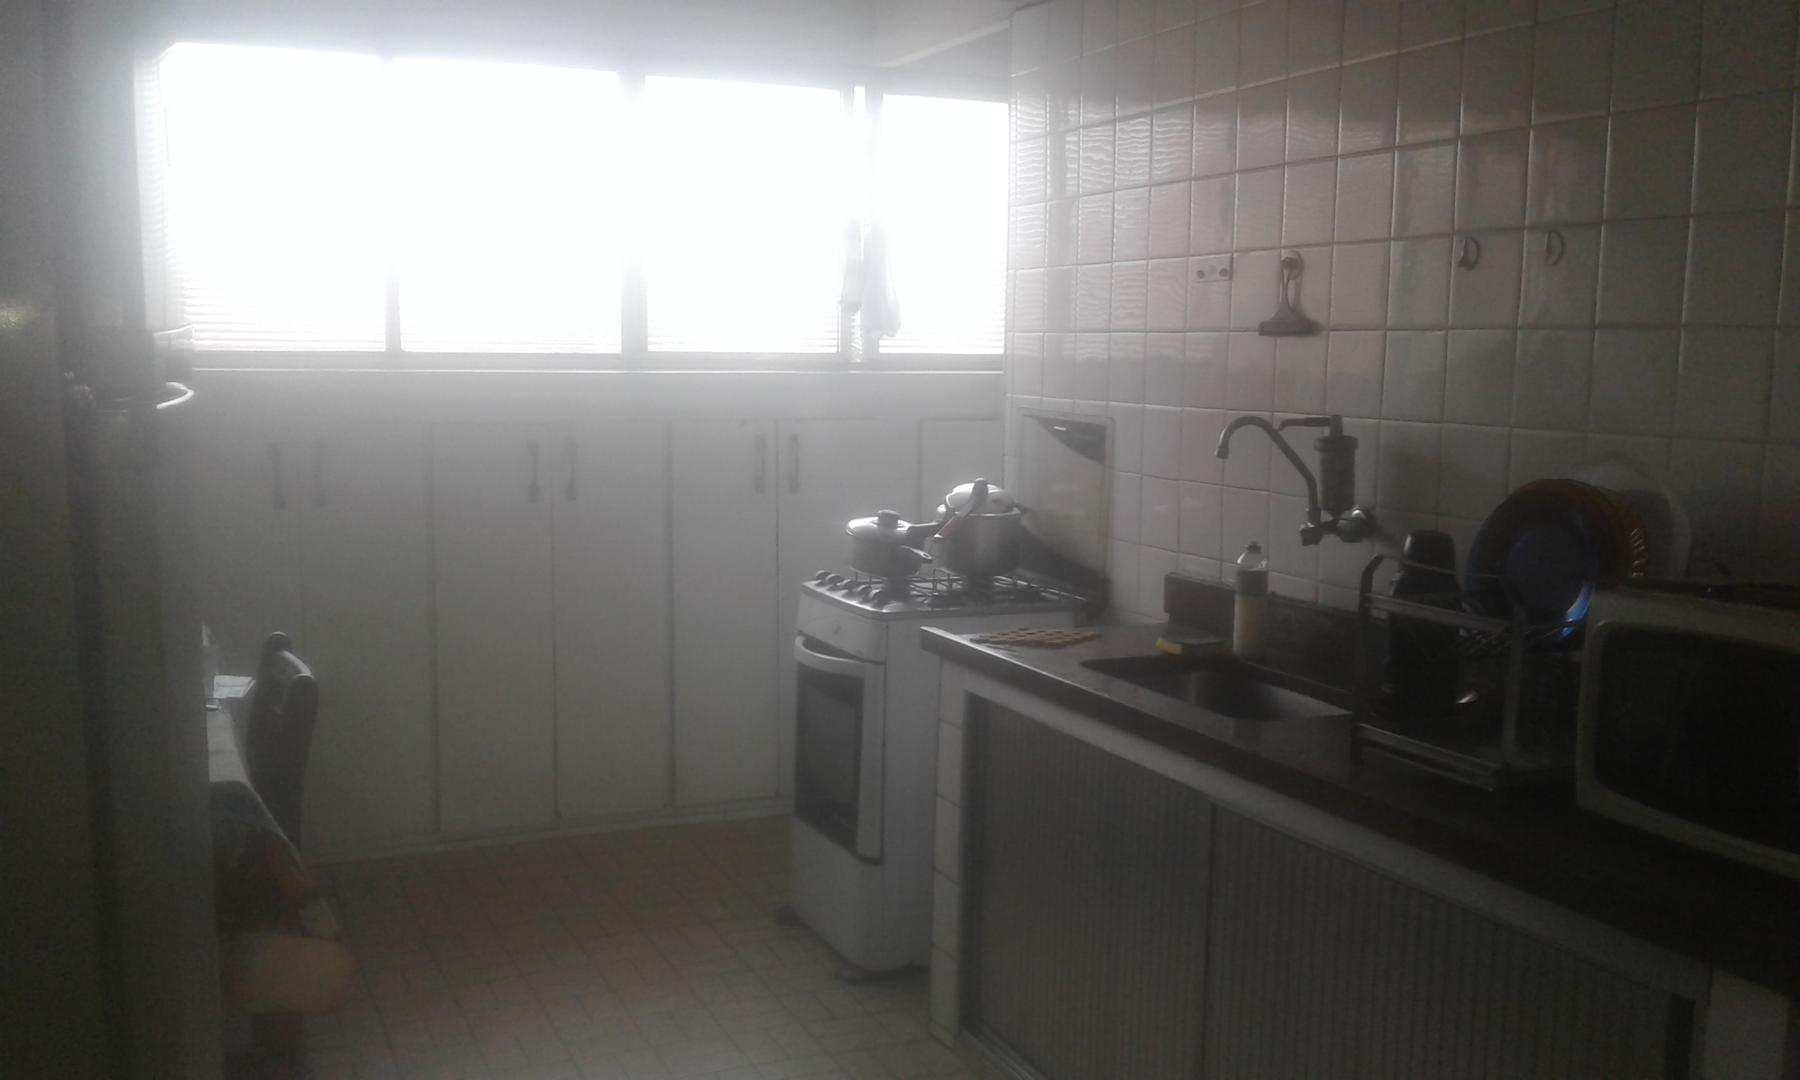 Apartamento com 3 dorms, Parque Cecap, Guarulhos - R$ 220 mil, Cod: 2040